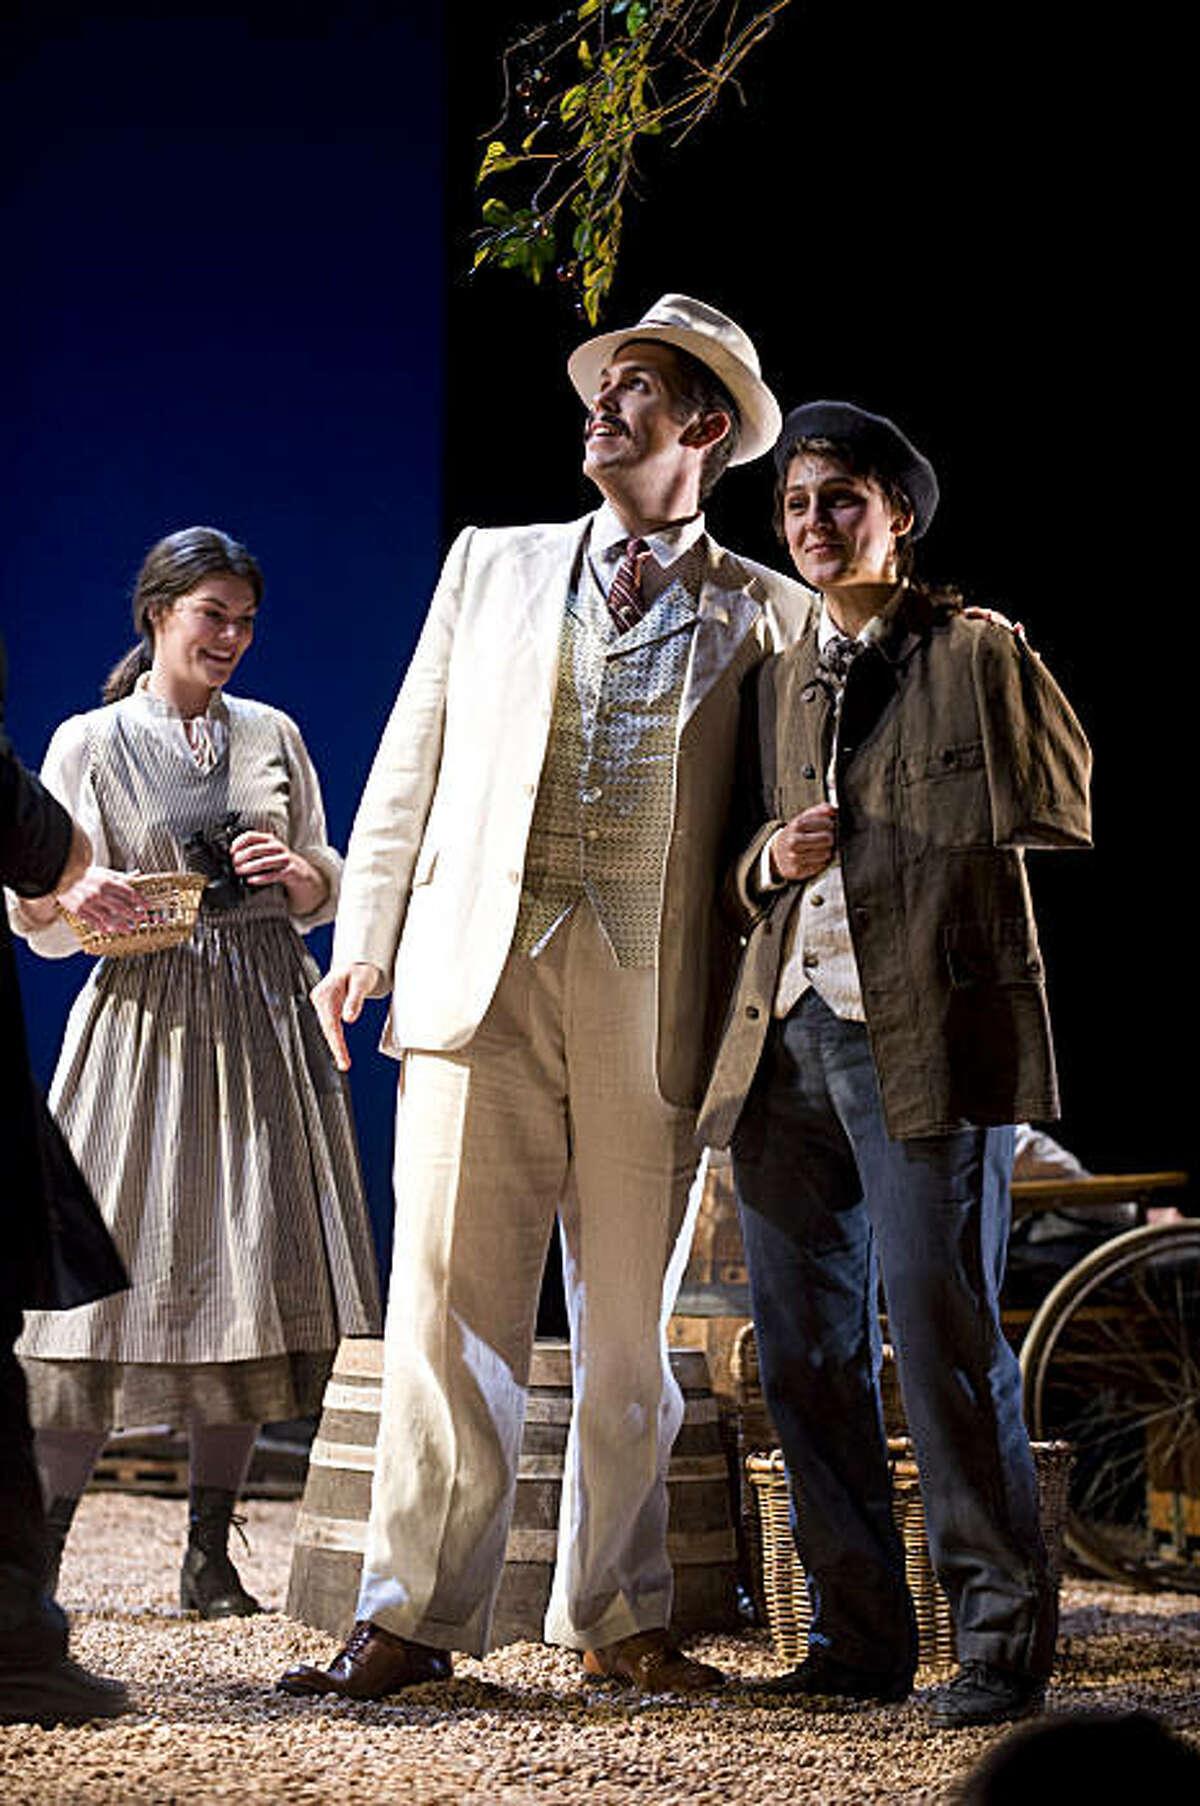 Sara Gartland (l.) as Suzel, Nathaniel Peake as Fritz, Maya Lahyani as Beppe in Mascagni's